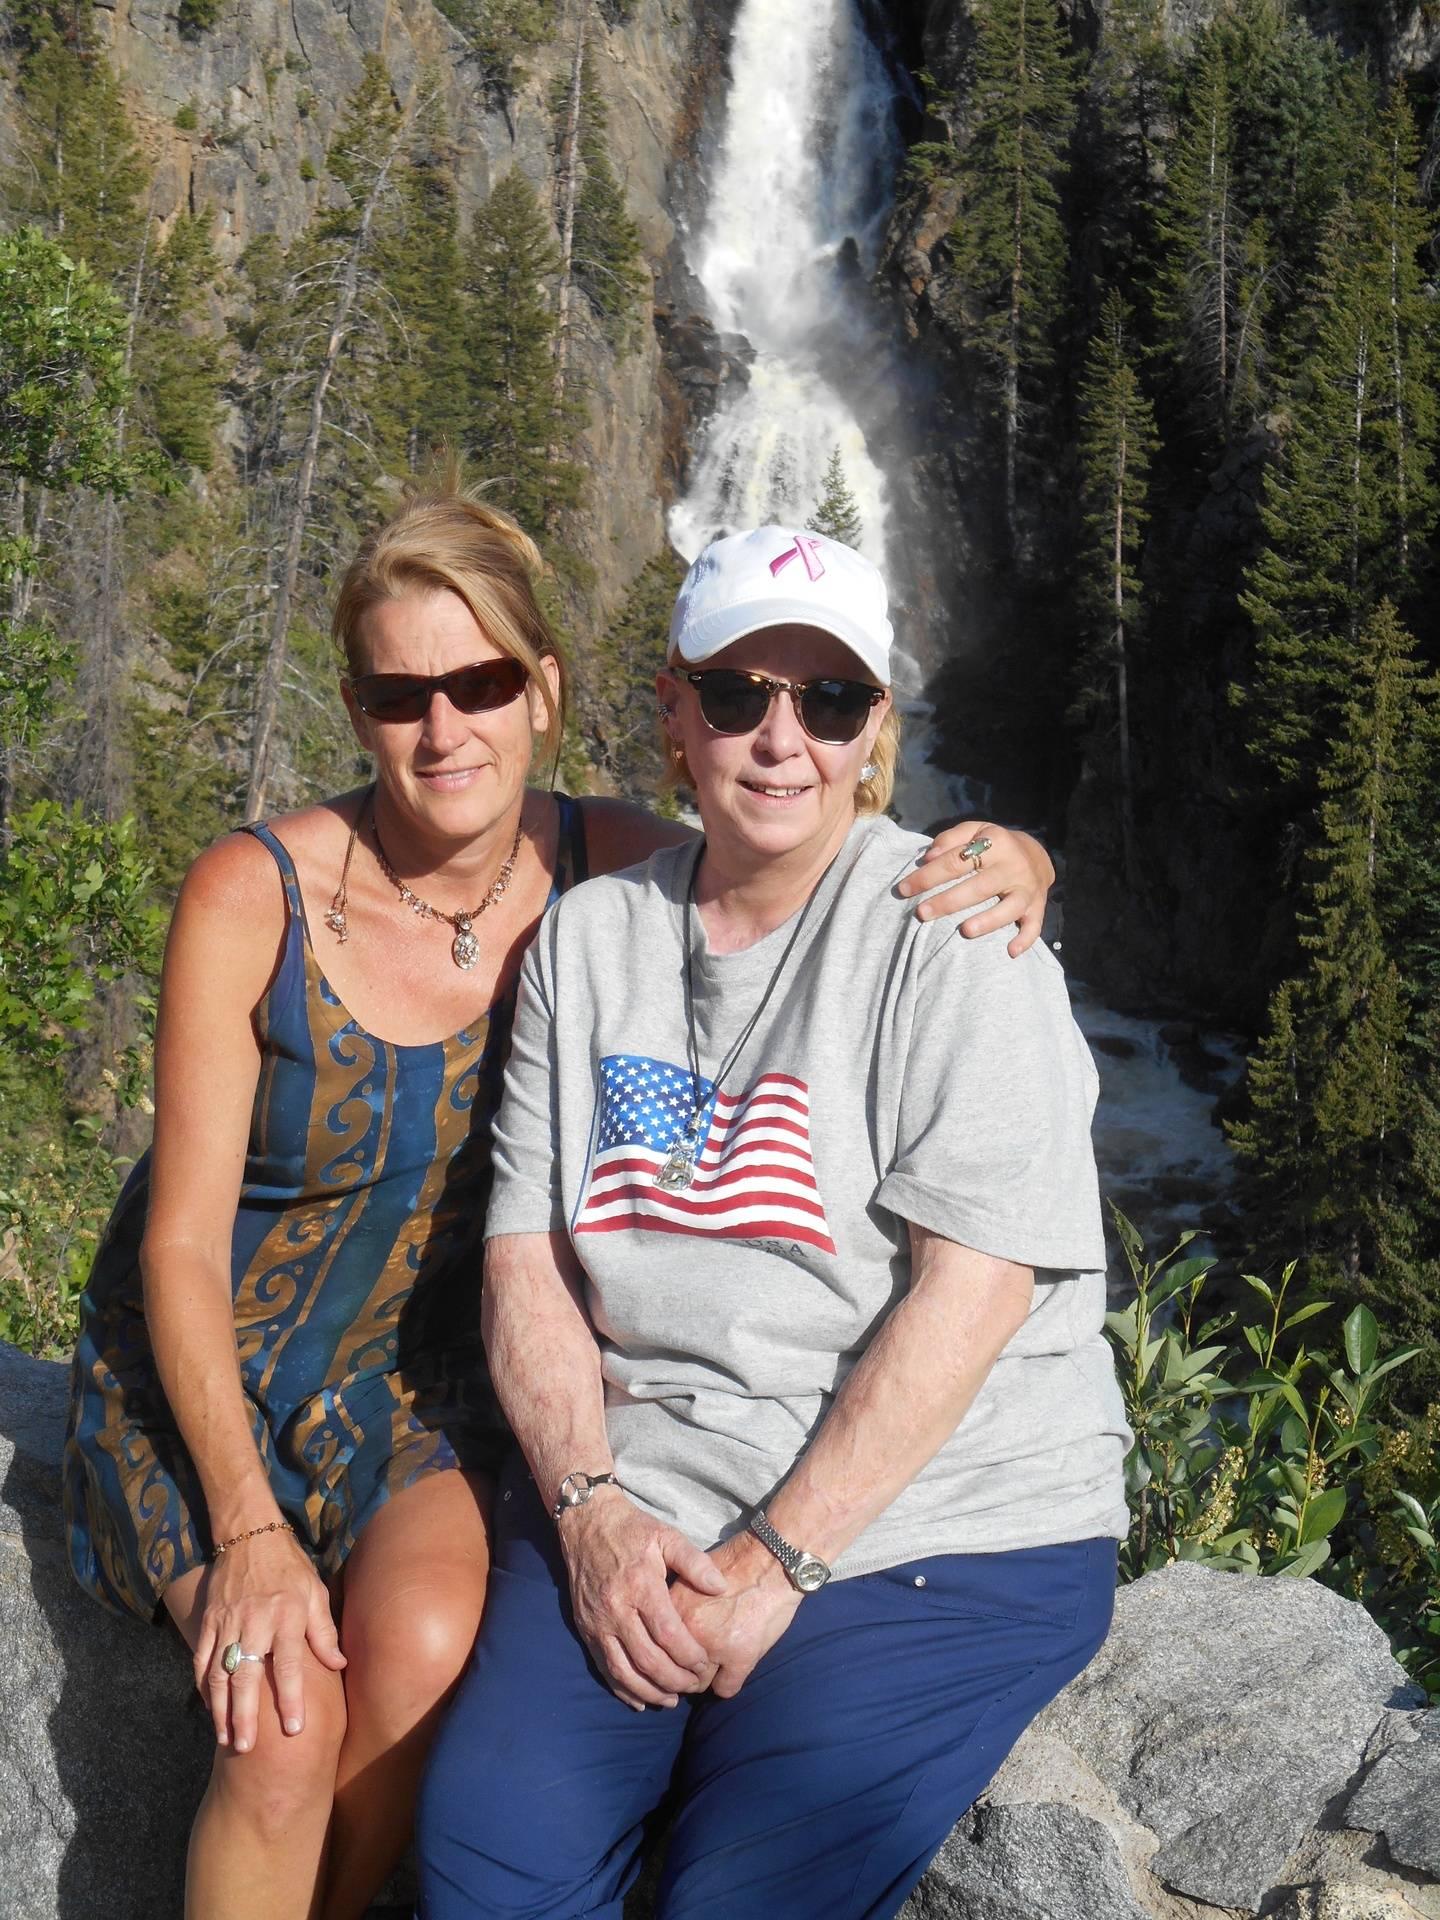 Adrienne & Linda at the falls